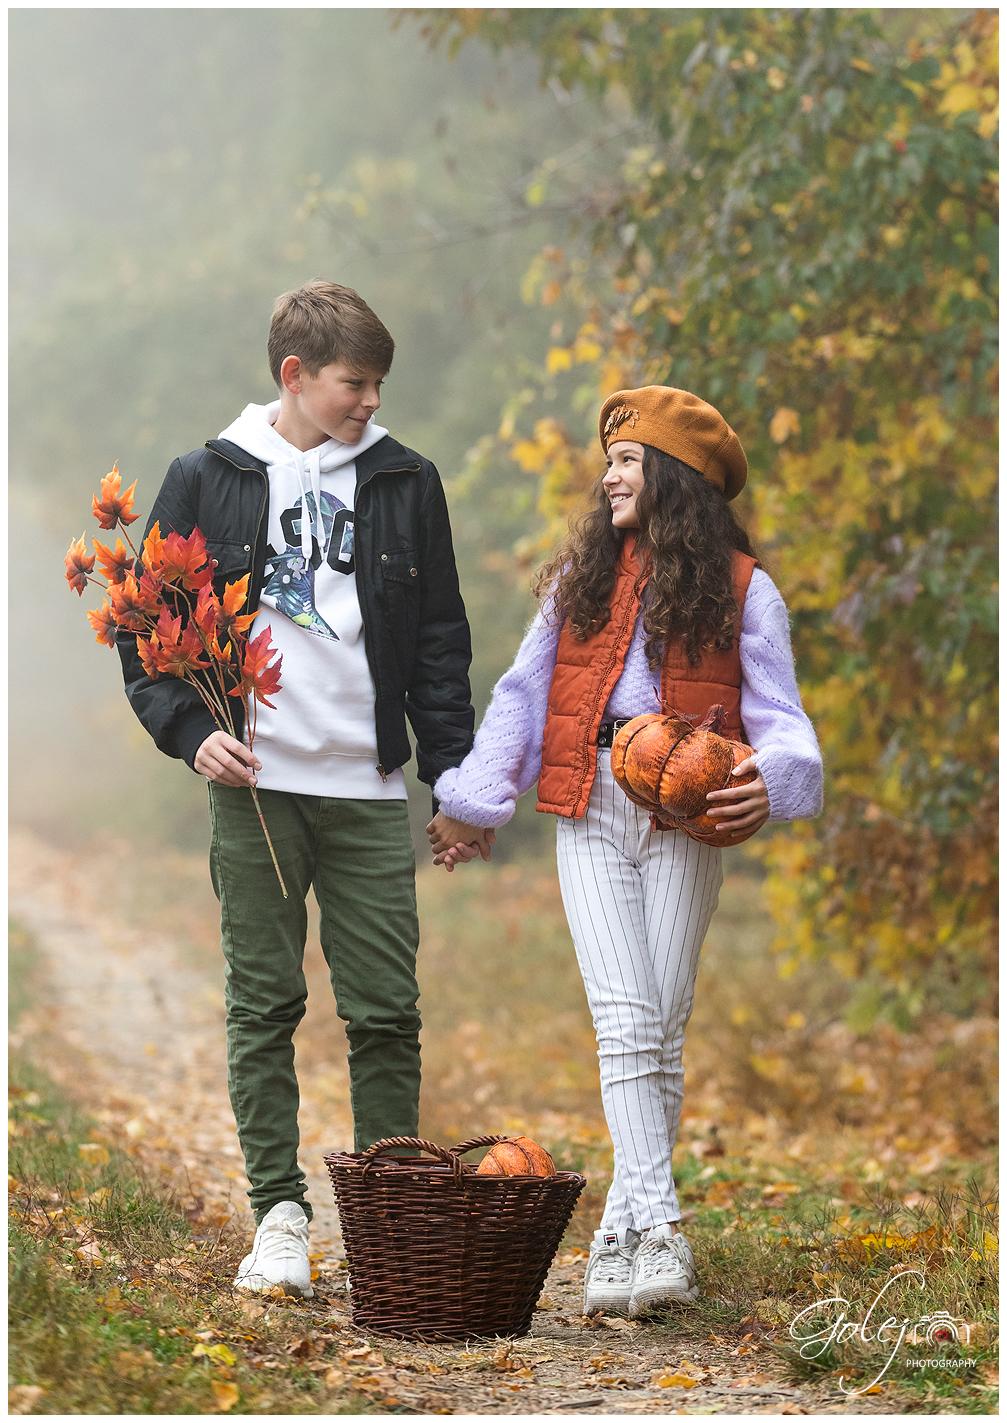 Fotenie na jesen